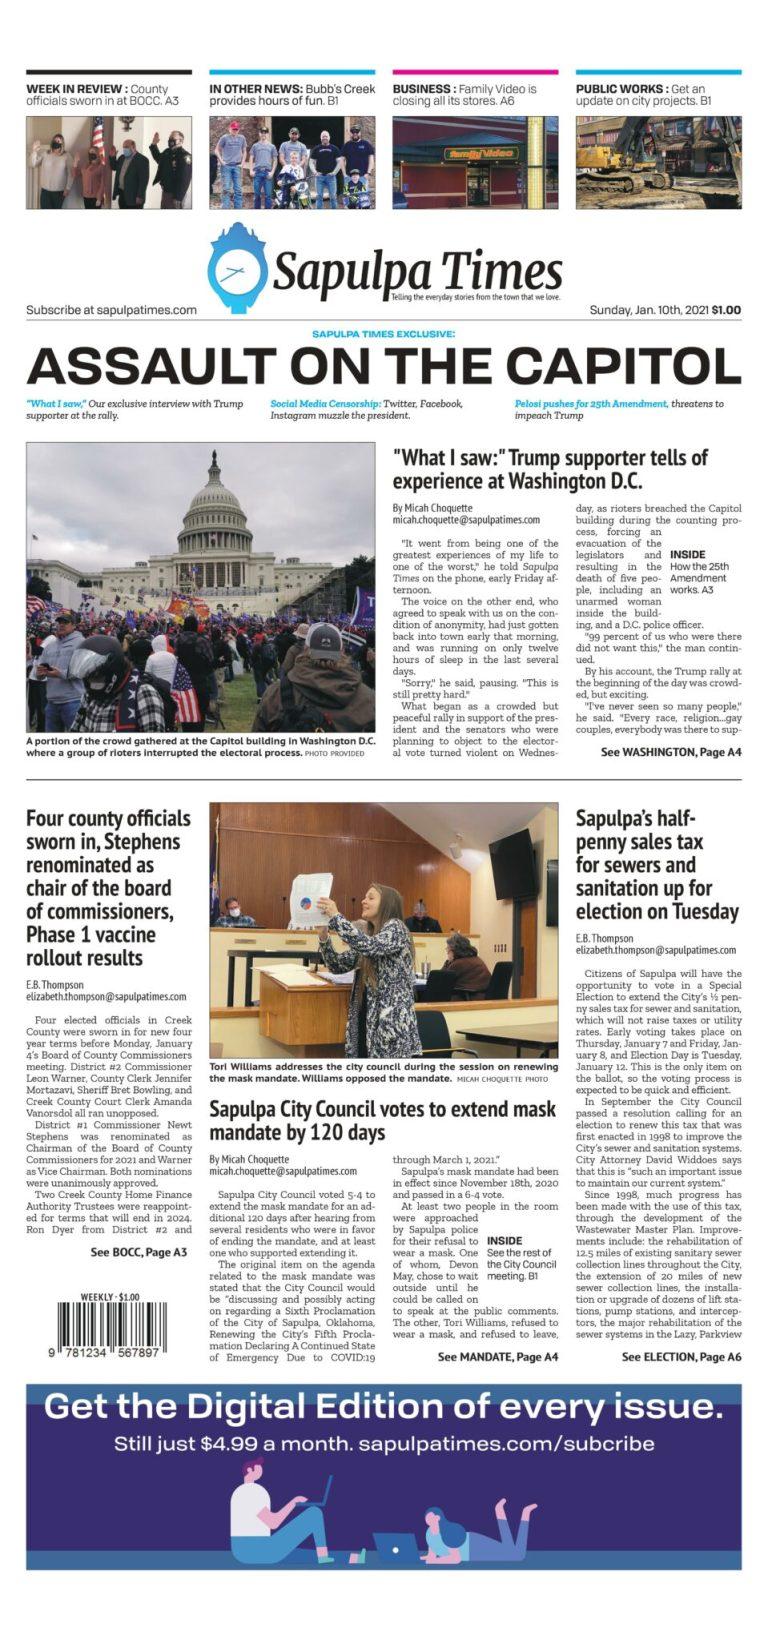 Sapulpa Times Digital Edition 01/10/2021